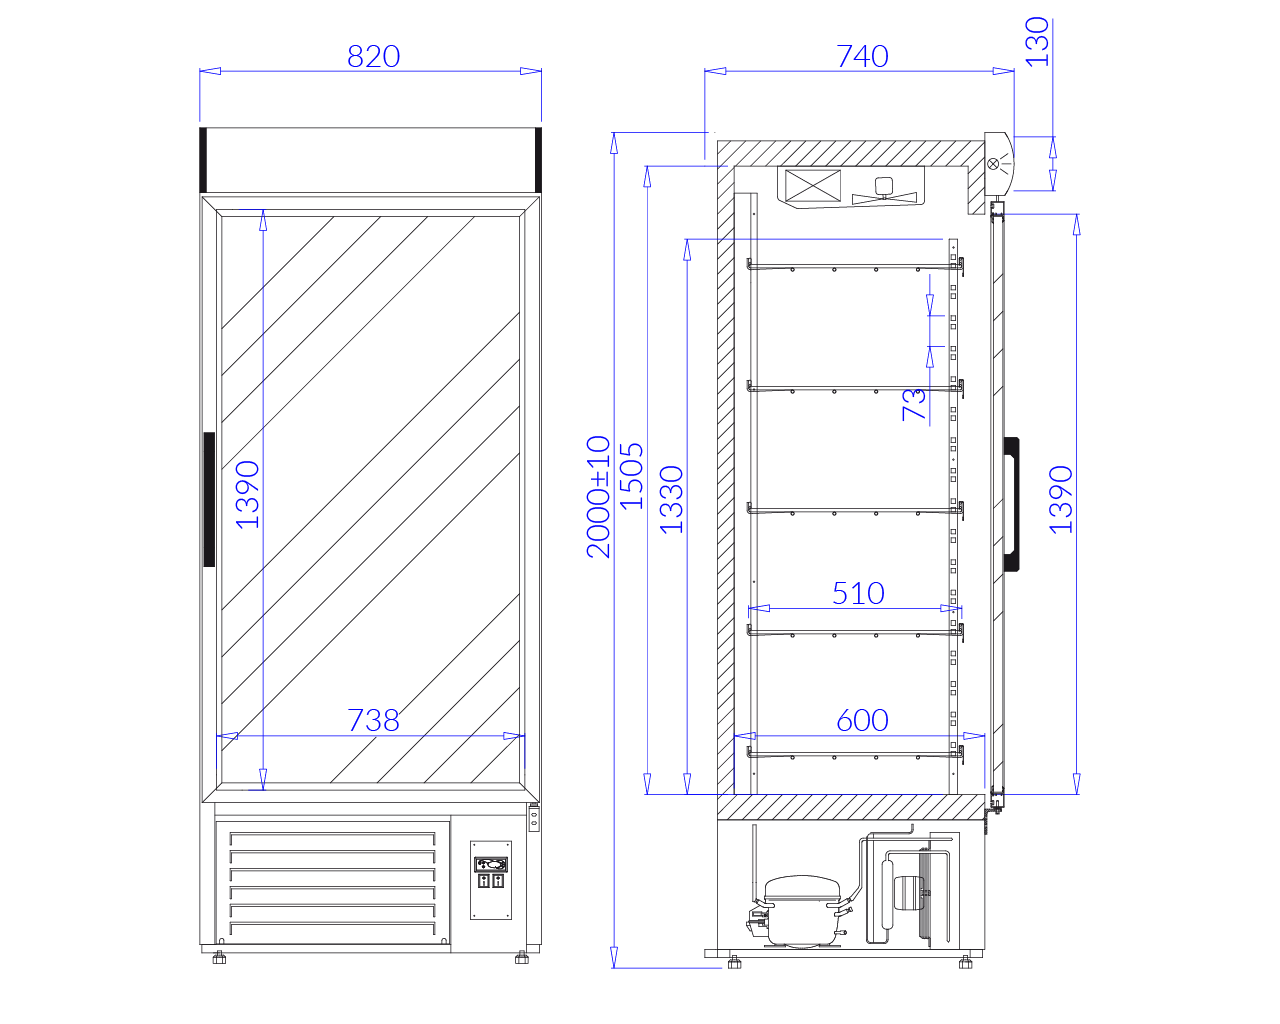 Technical drawing Beverage fridge cabinets JOLA 1 NAP